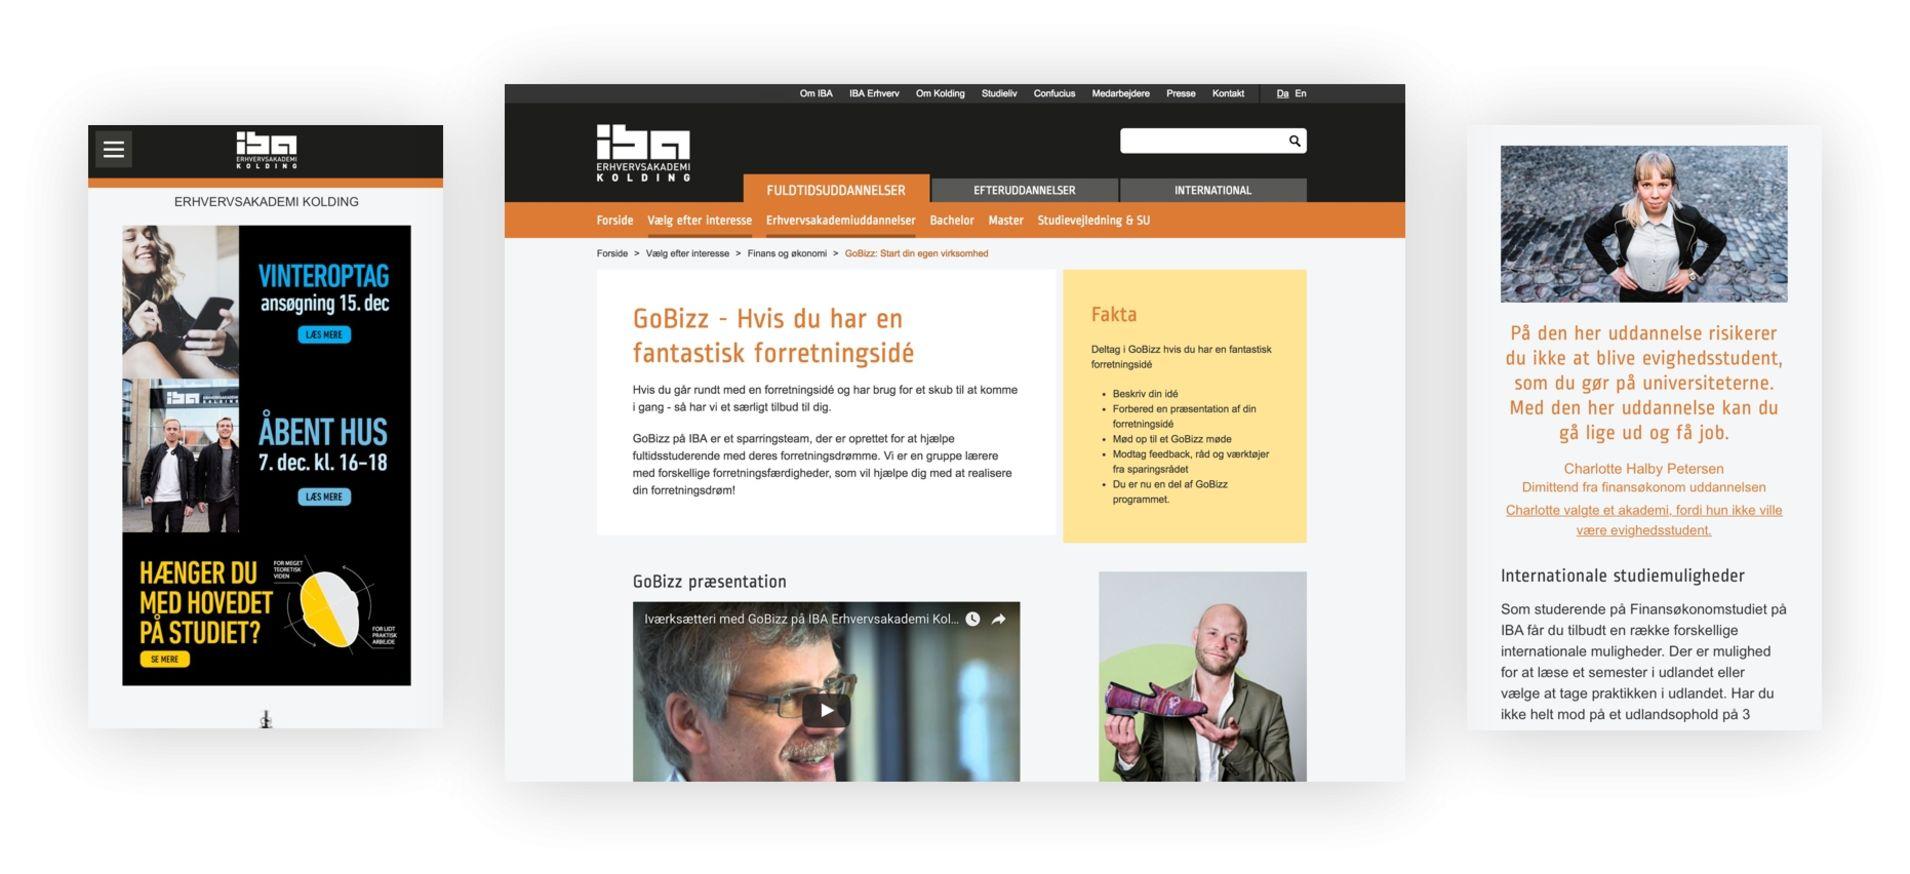 Responsive webshop fra e-handelshuset Hesehus